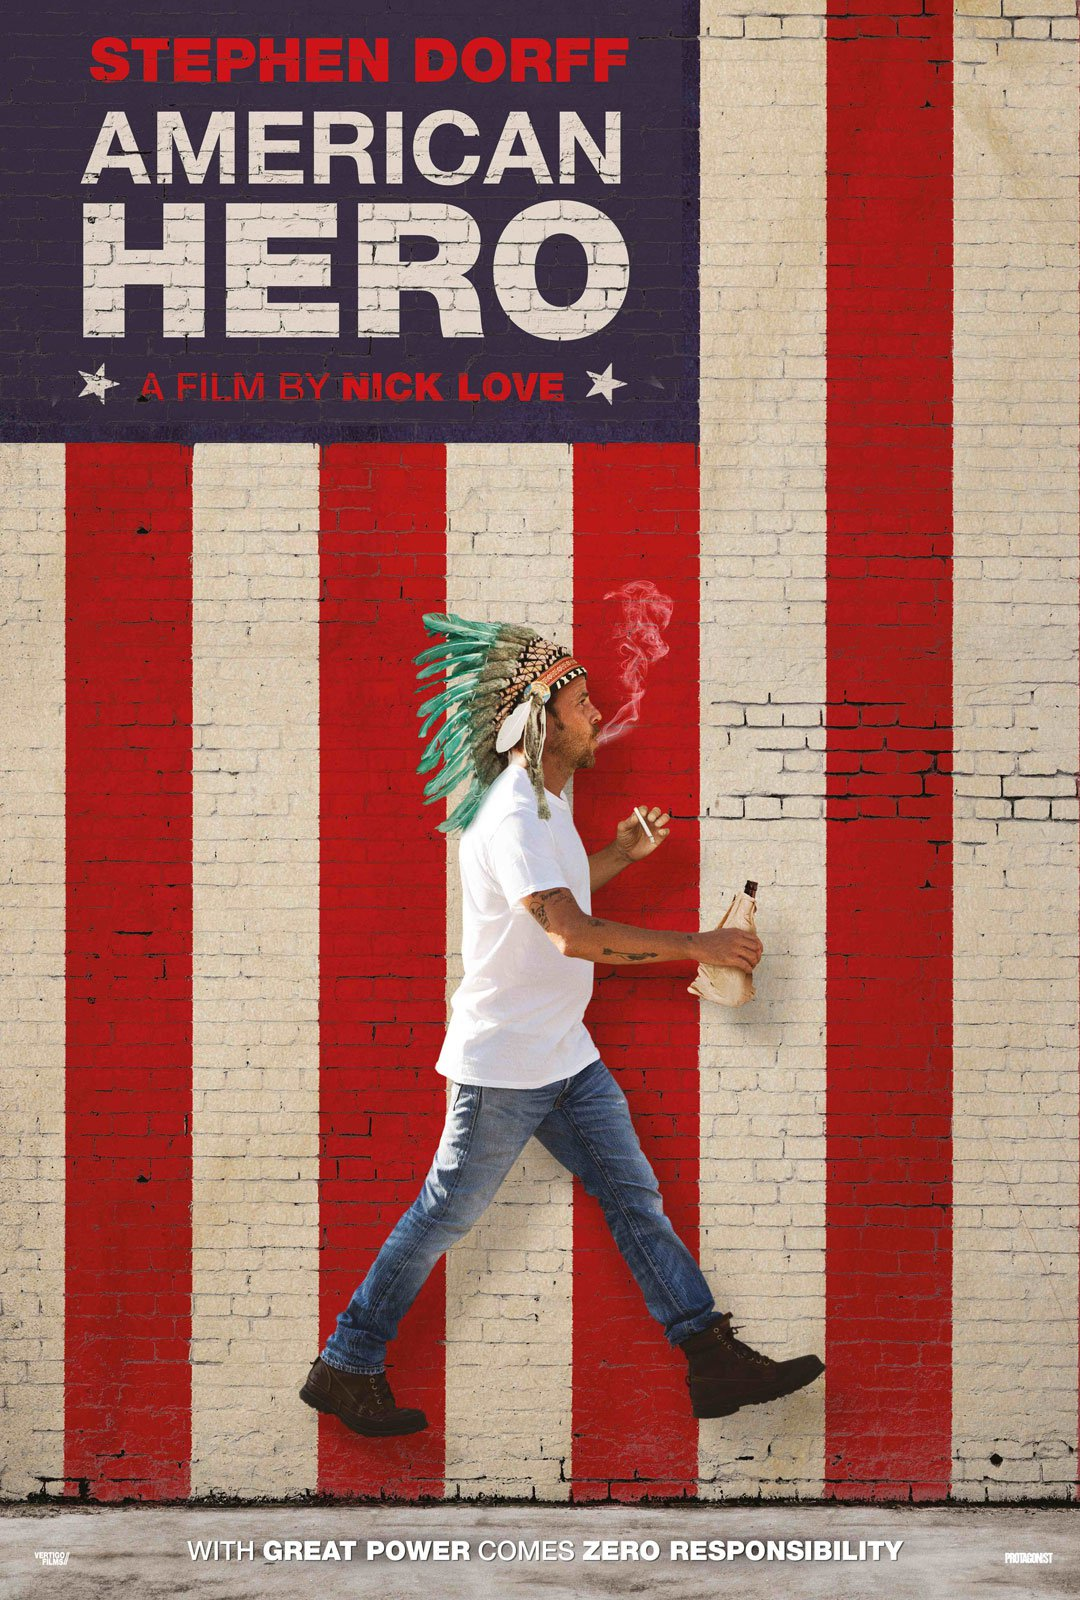 American-hero-Poster.jpg